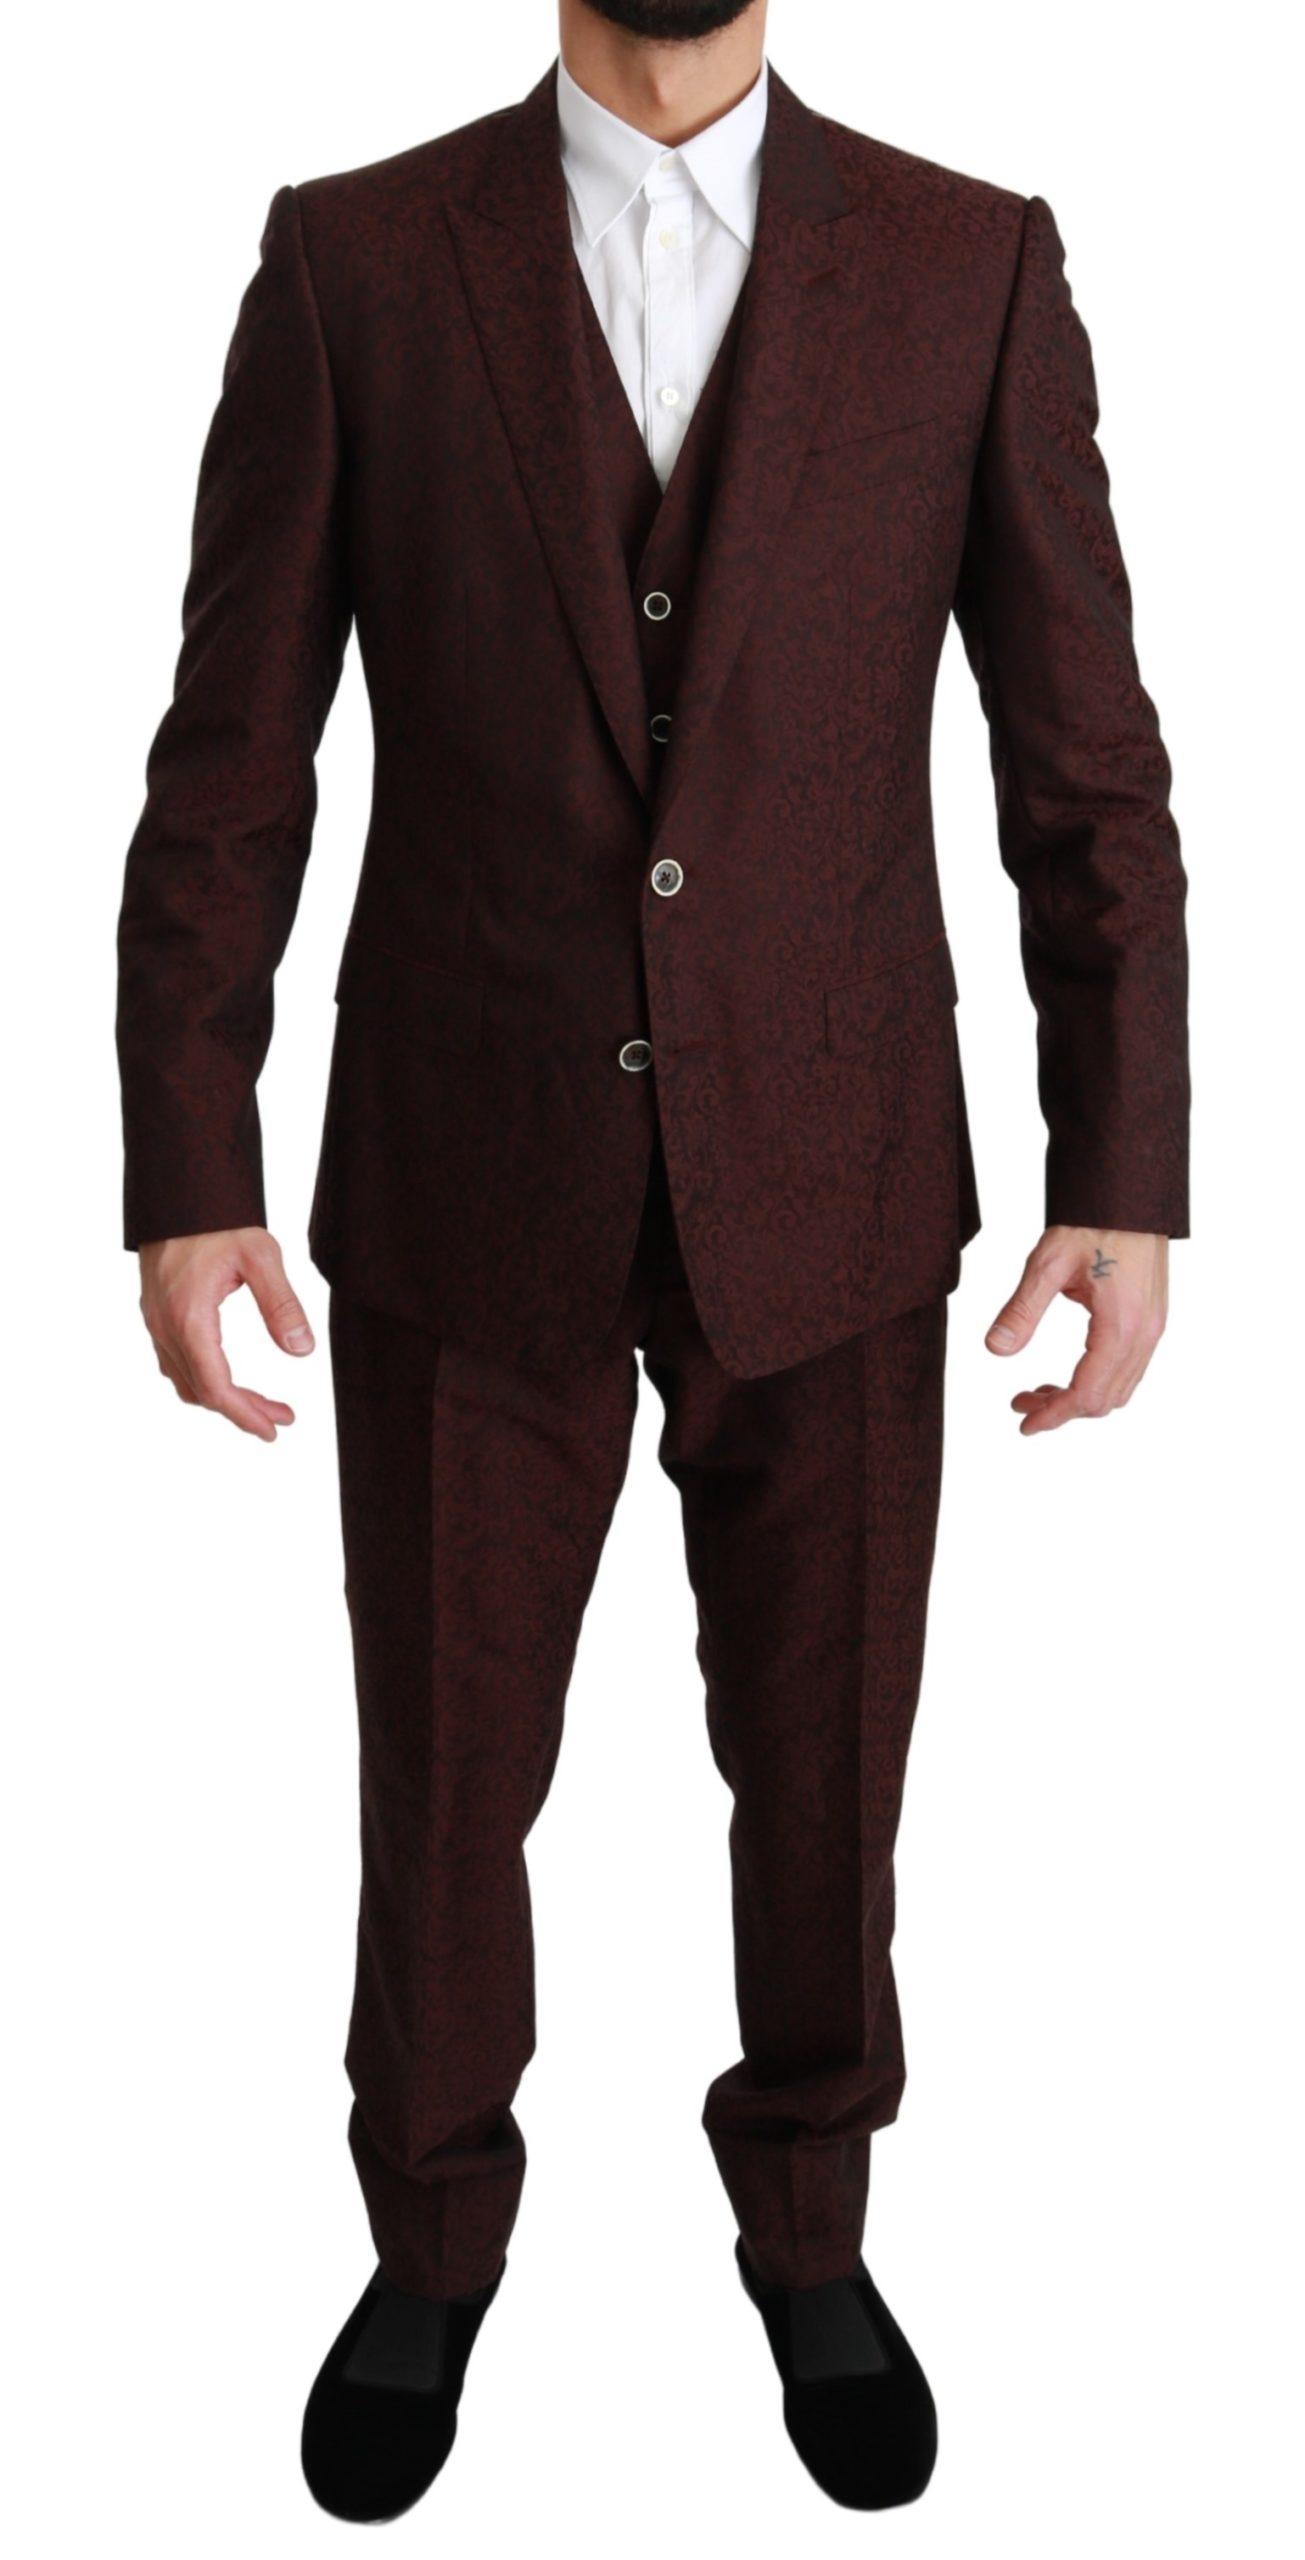 Dolce & Gabbana Men's Brocade 3 Piece Wool MARTINI Suit Bordeaux KOS1629 - IT50   L